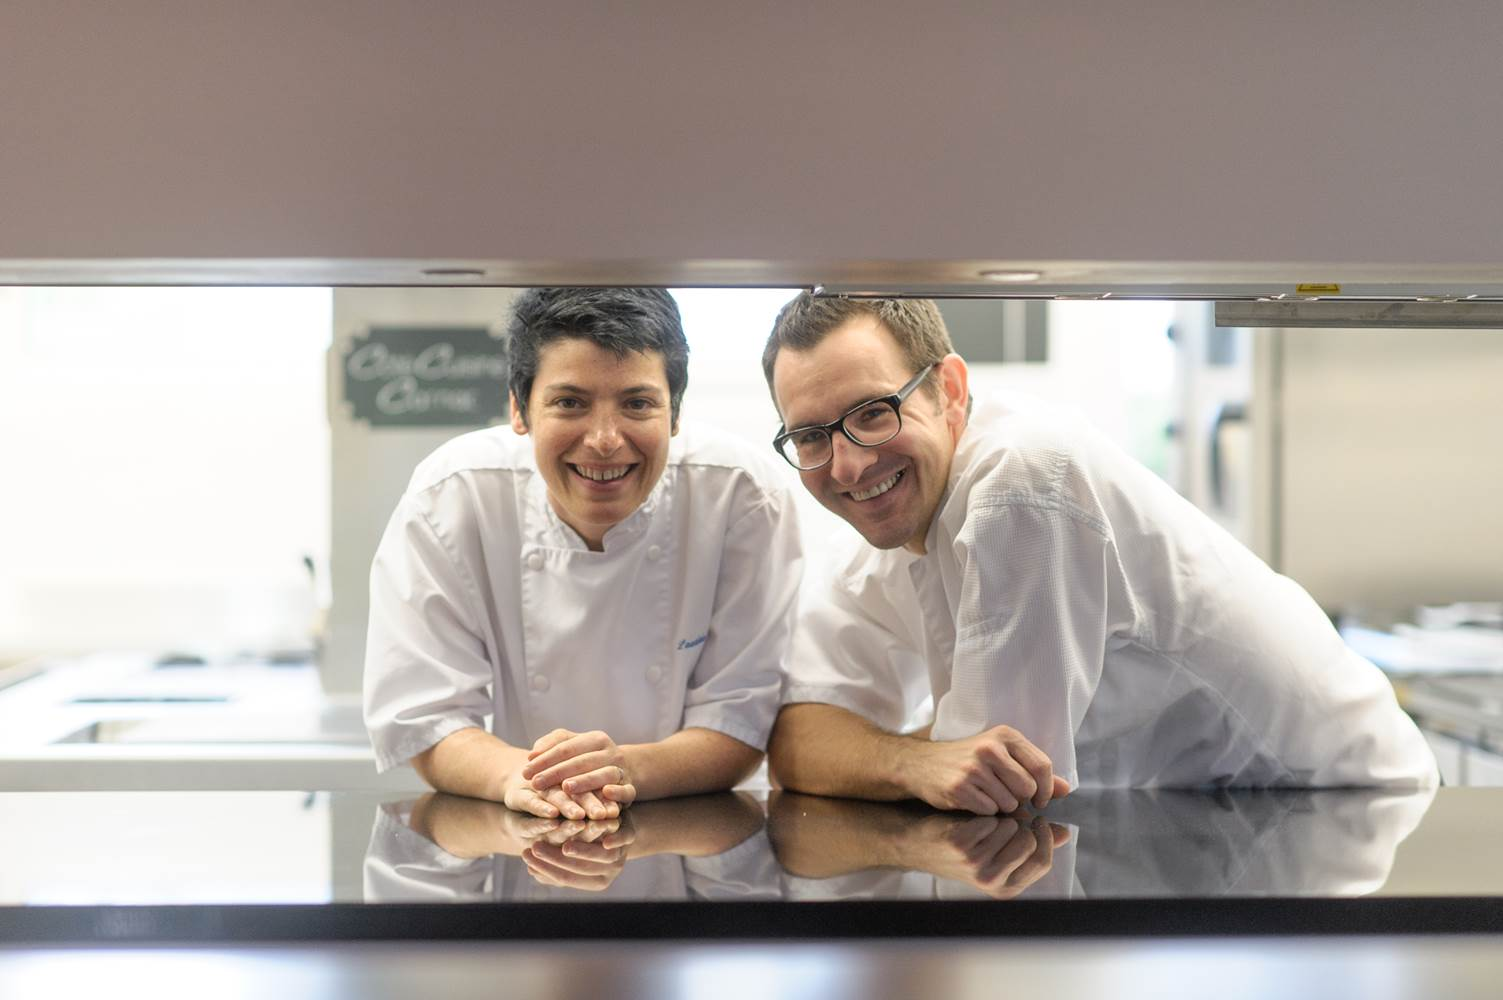 restaurant-cote-cuisine- Carnac-morbihan-bretagne-sud © restaurant-cote-cuisine